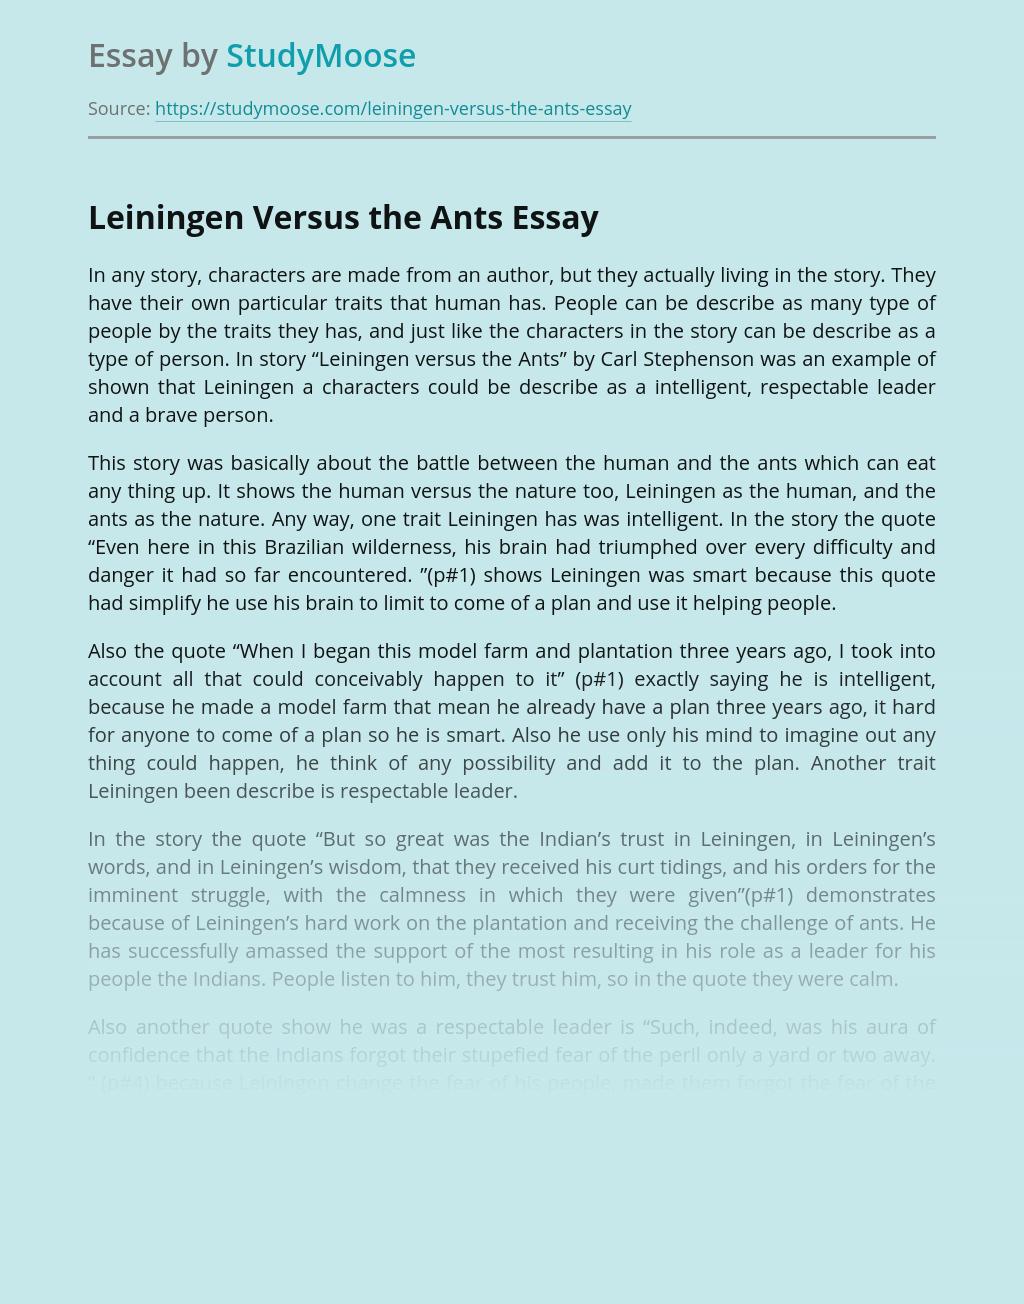 Leiningen Versus the Ants Story Analysis